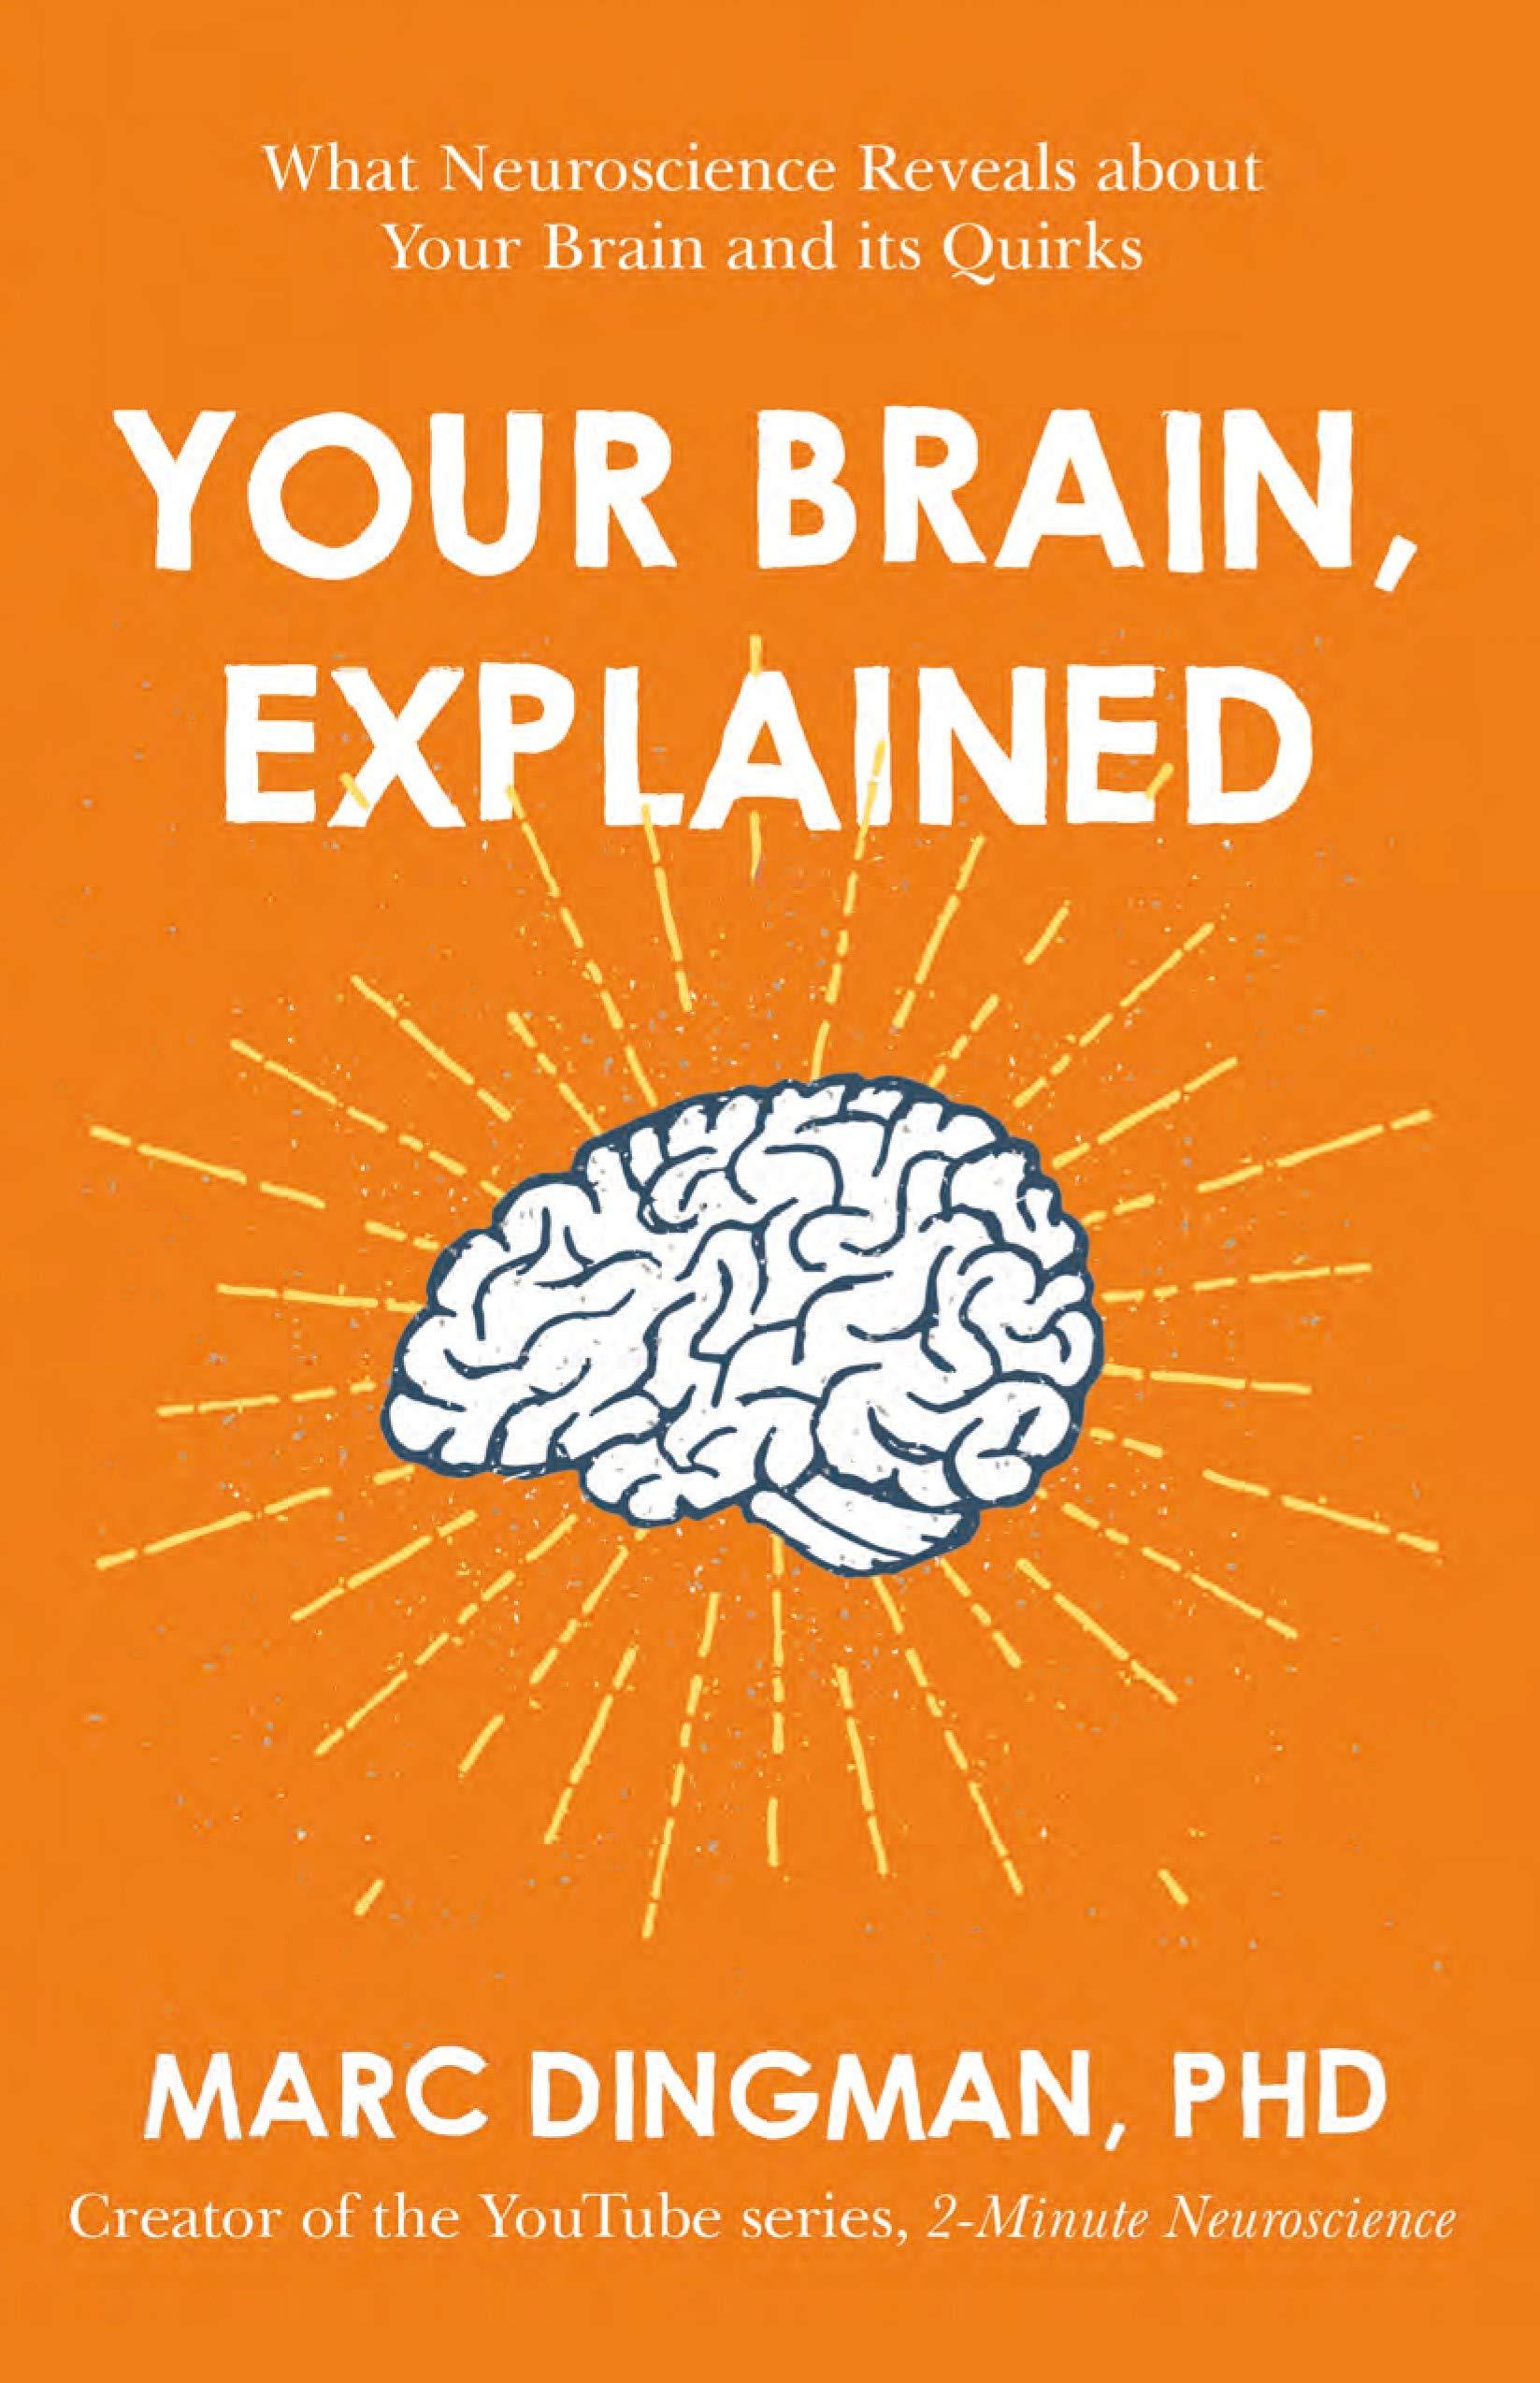 BrainExplained